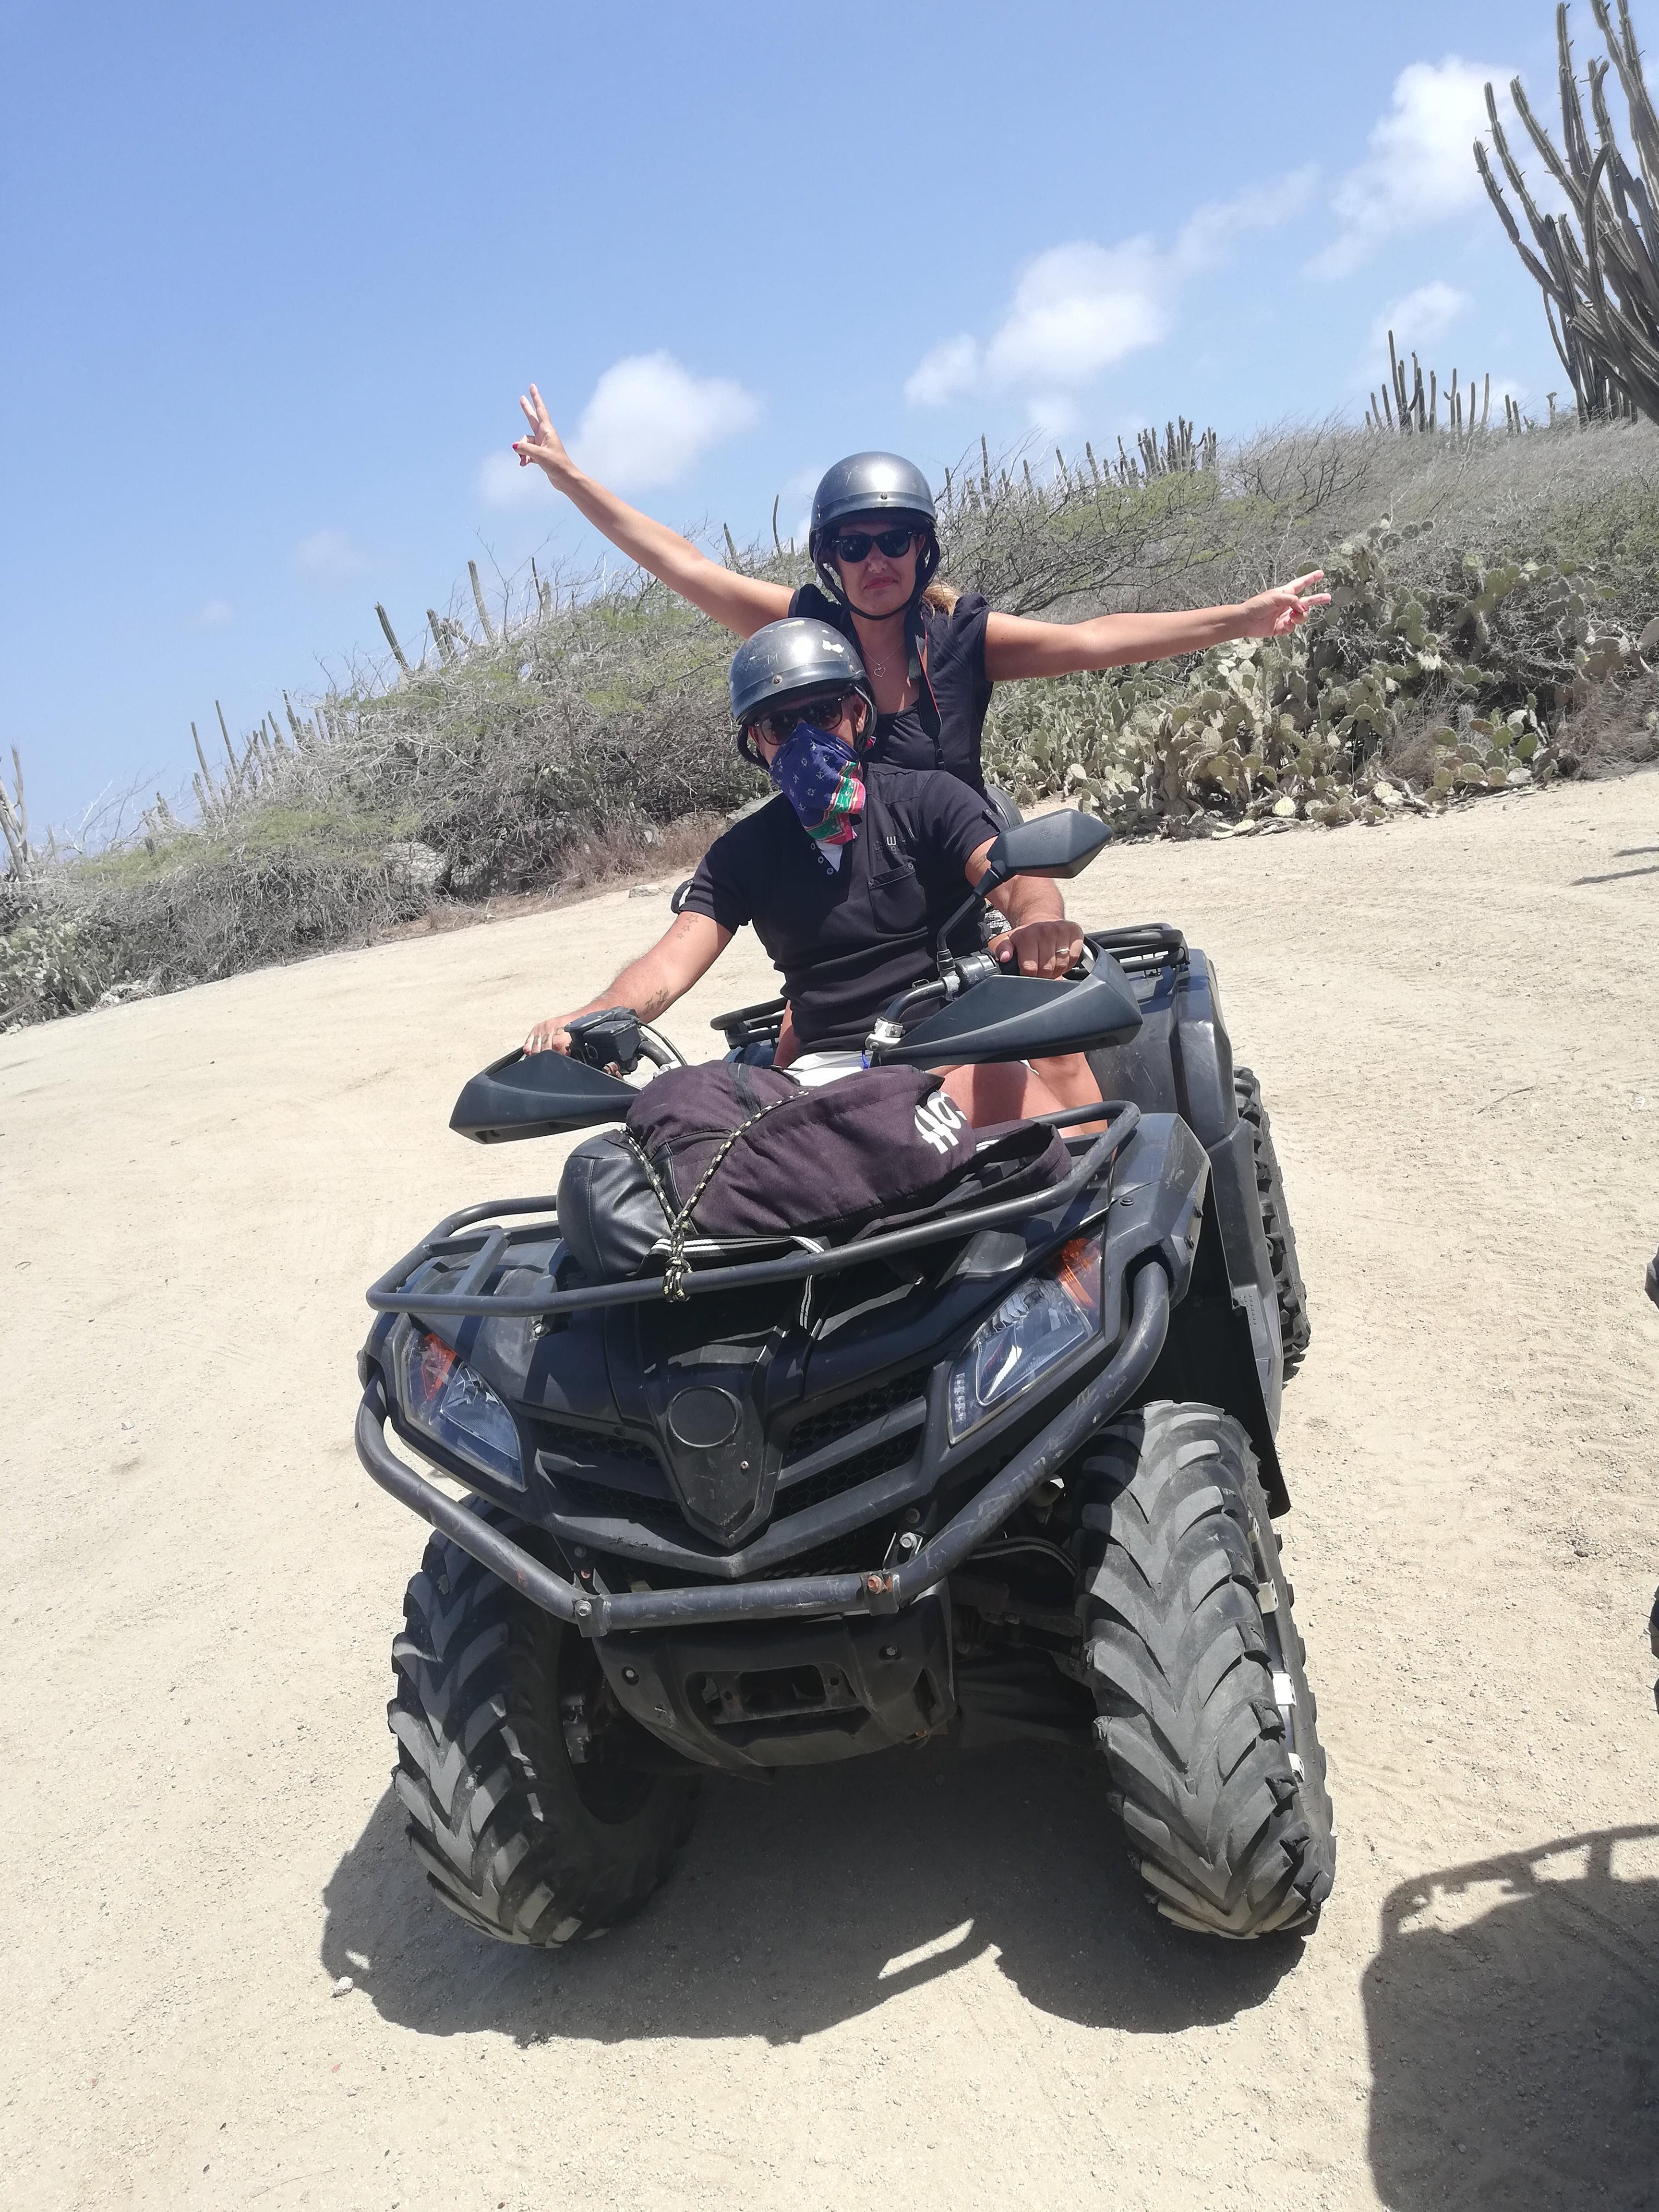 ACTION TOURS ARUBA, TOUR IN QUAD (ATV)